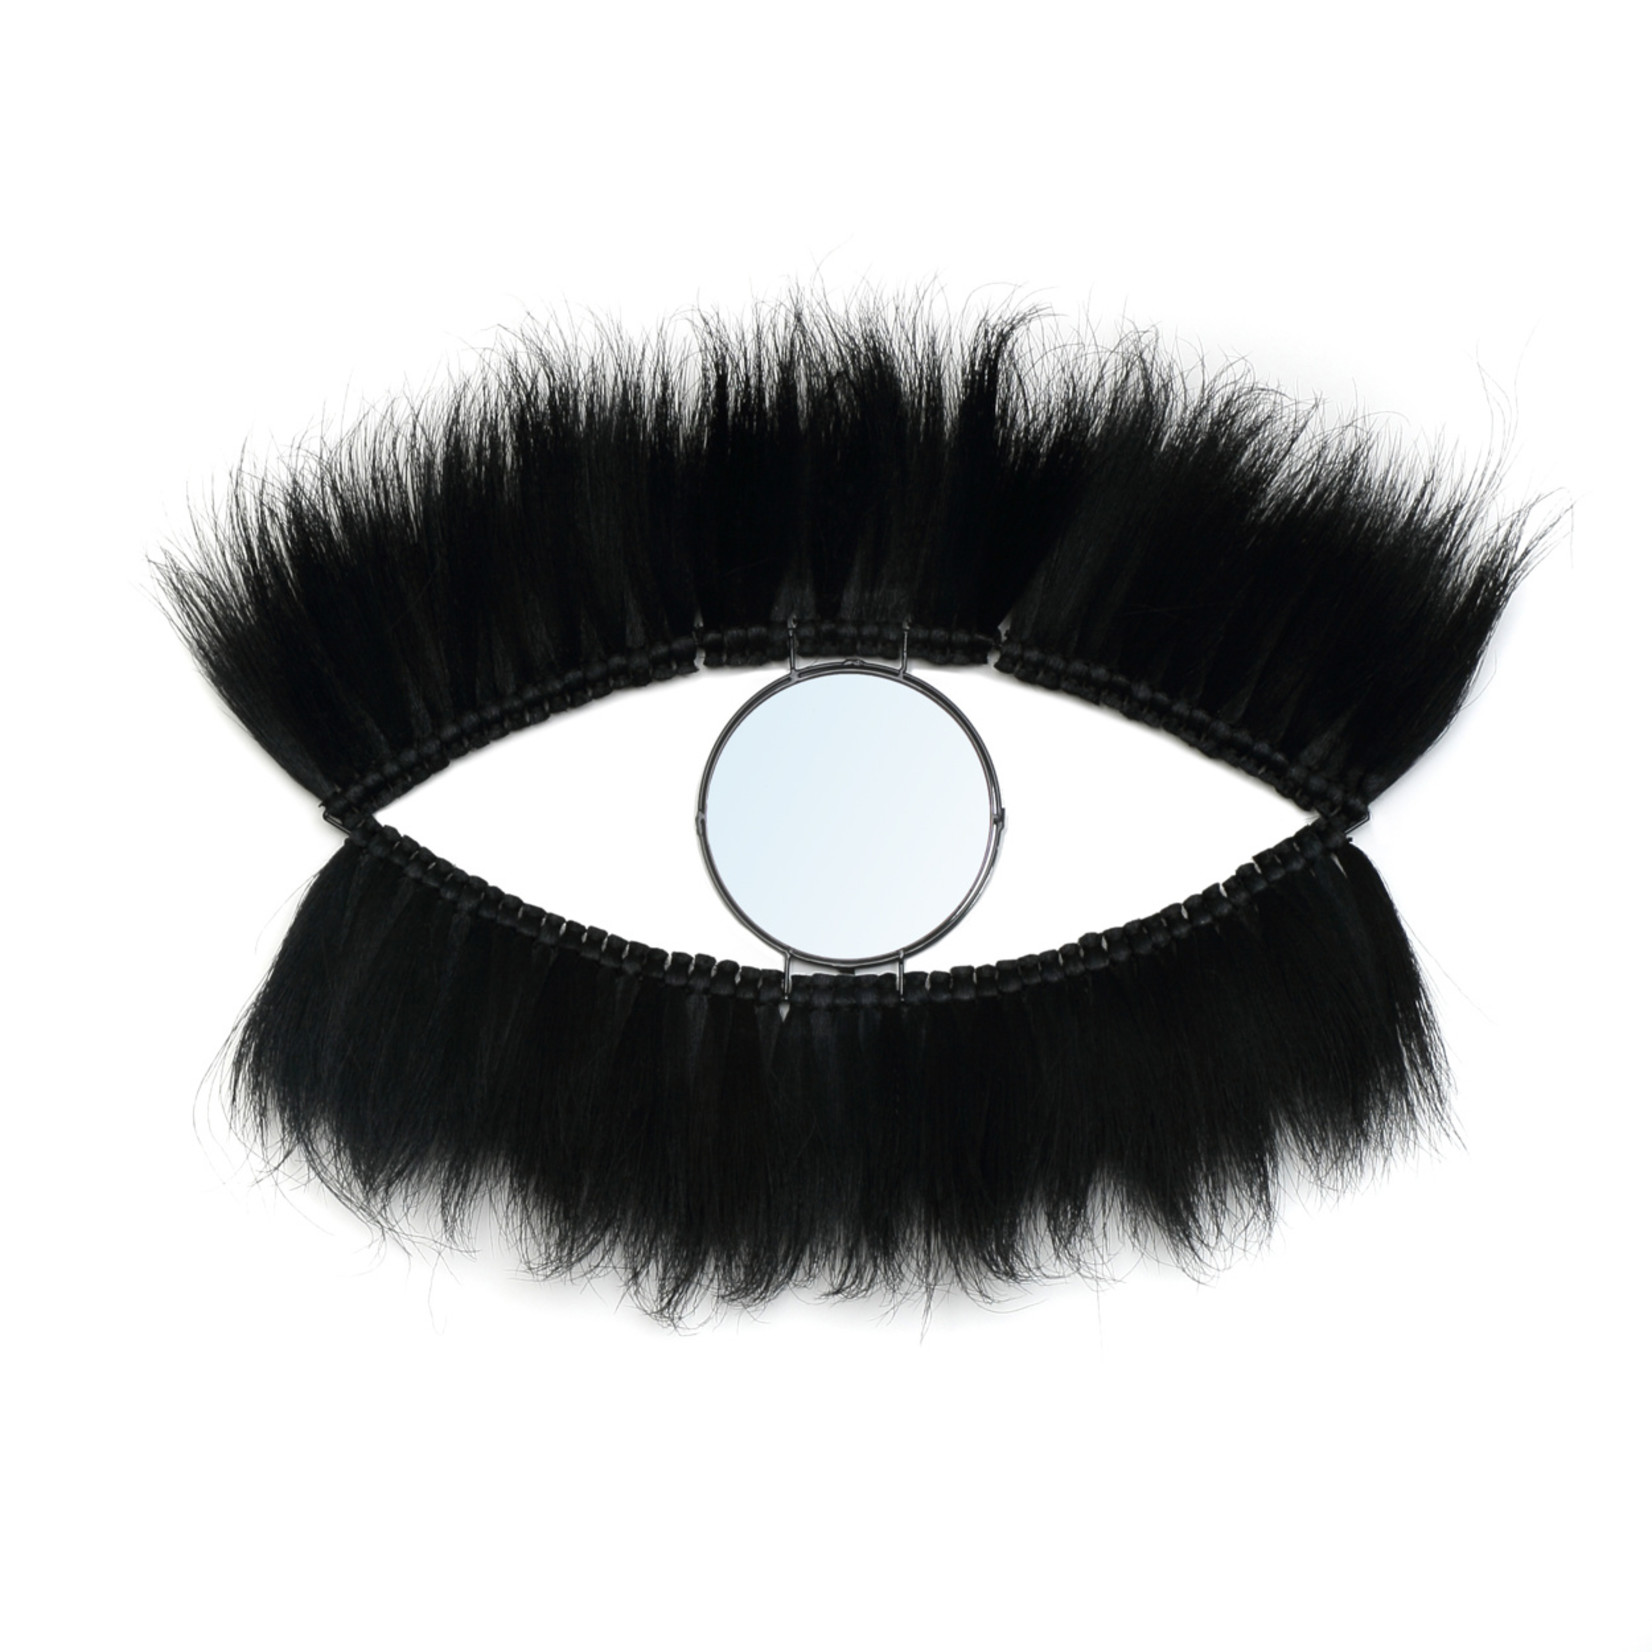 Bazar Bizar The Black Eye Mirror - Black